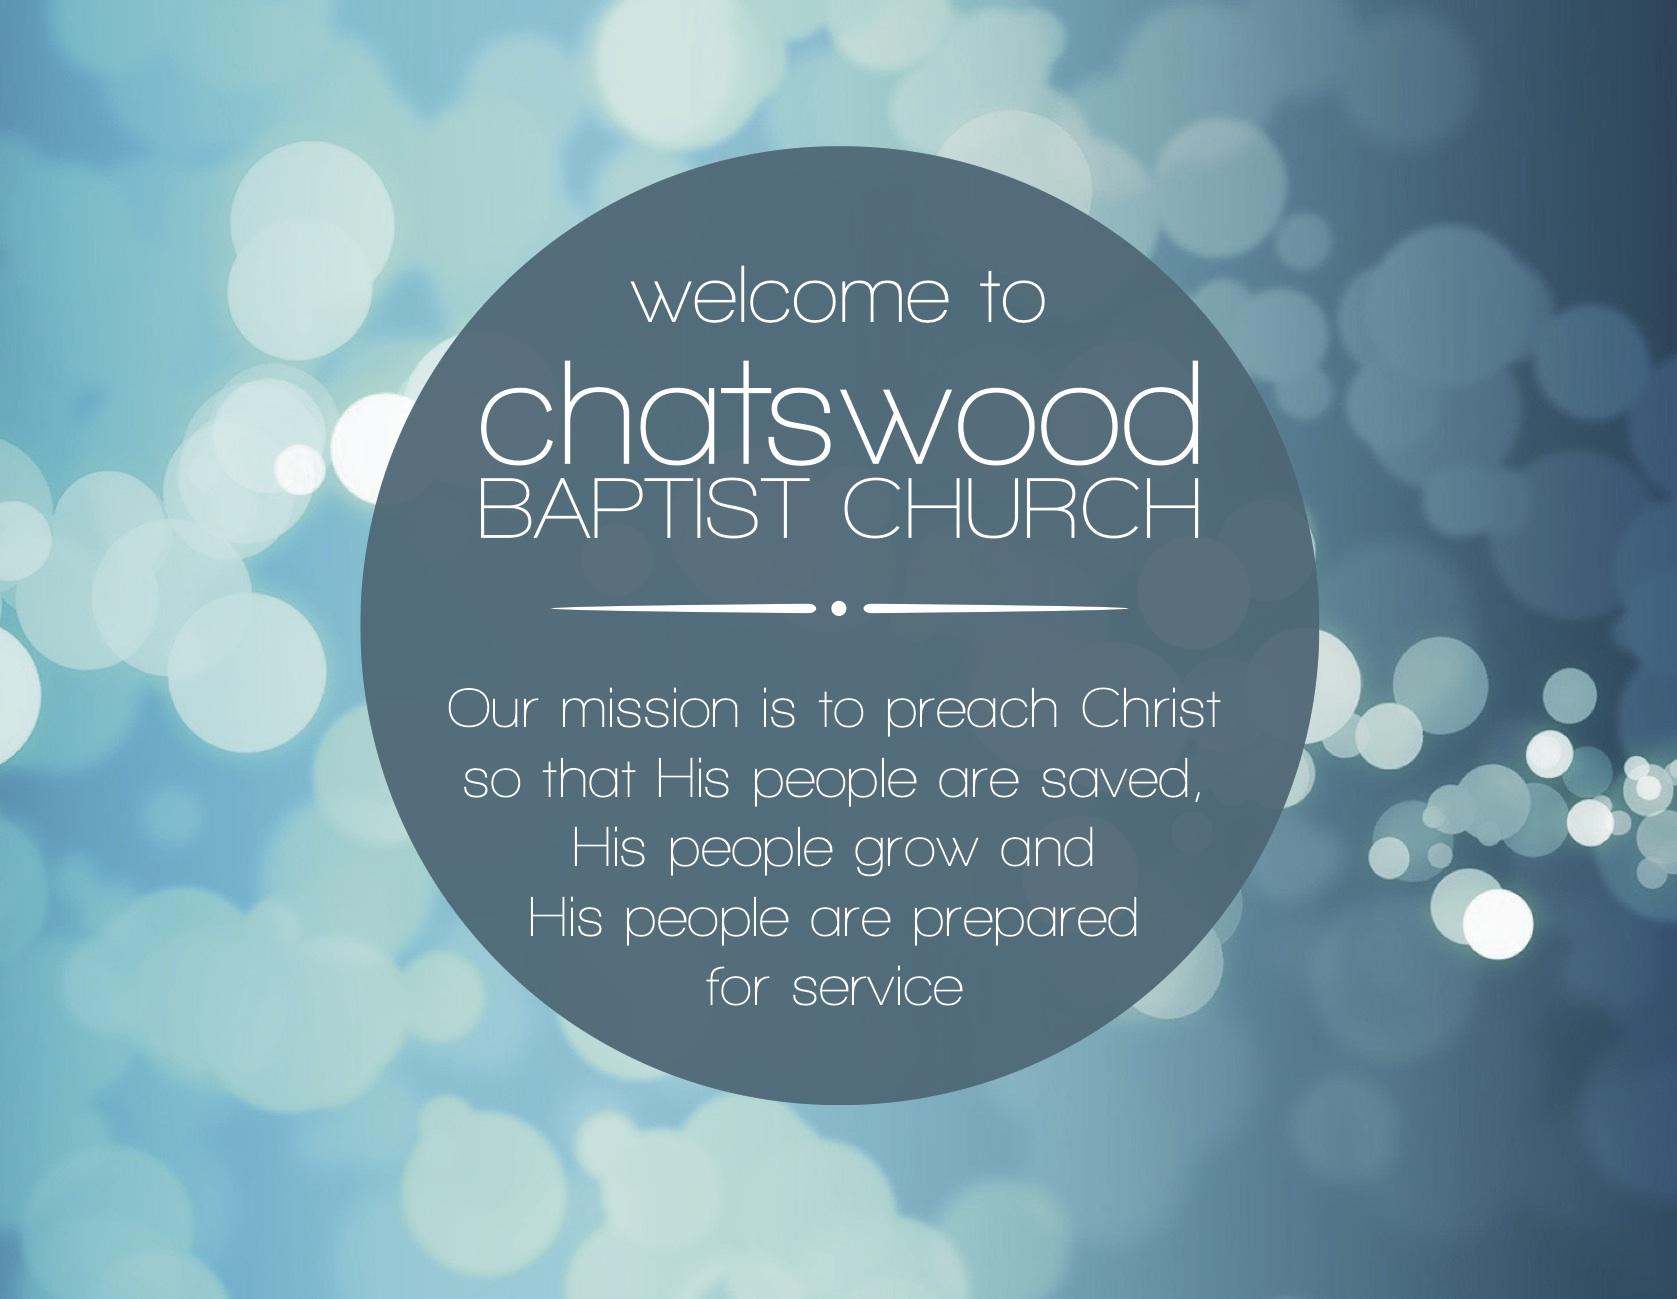 Chatswood Baptist